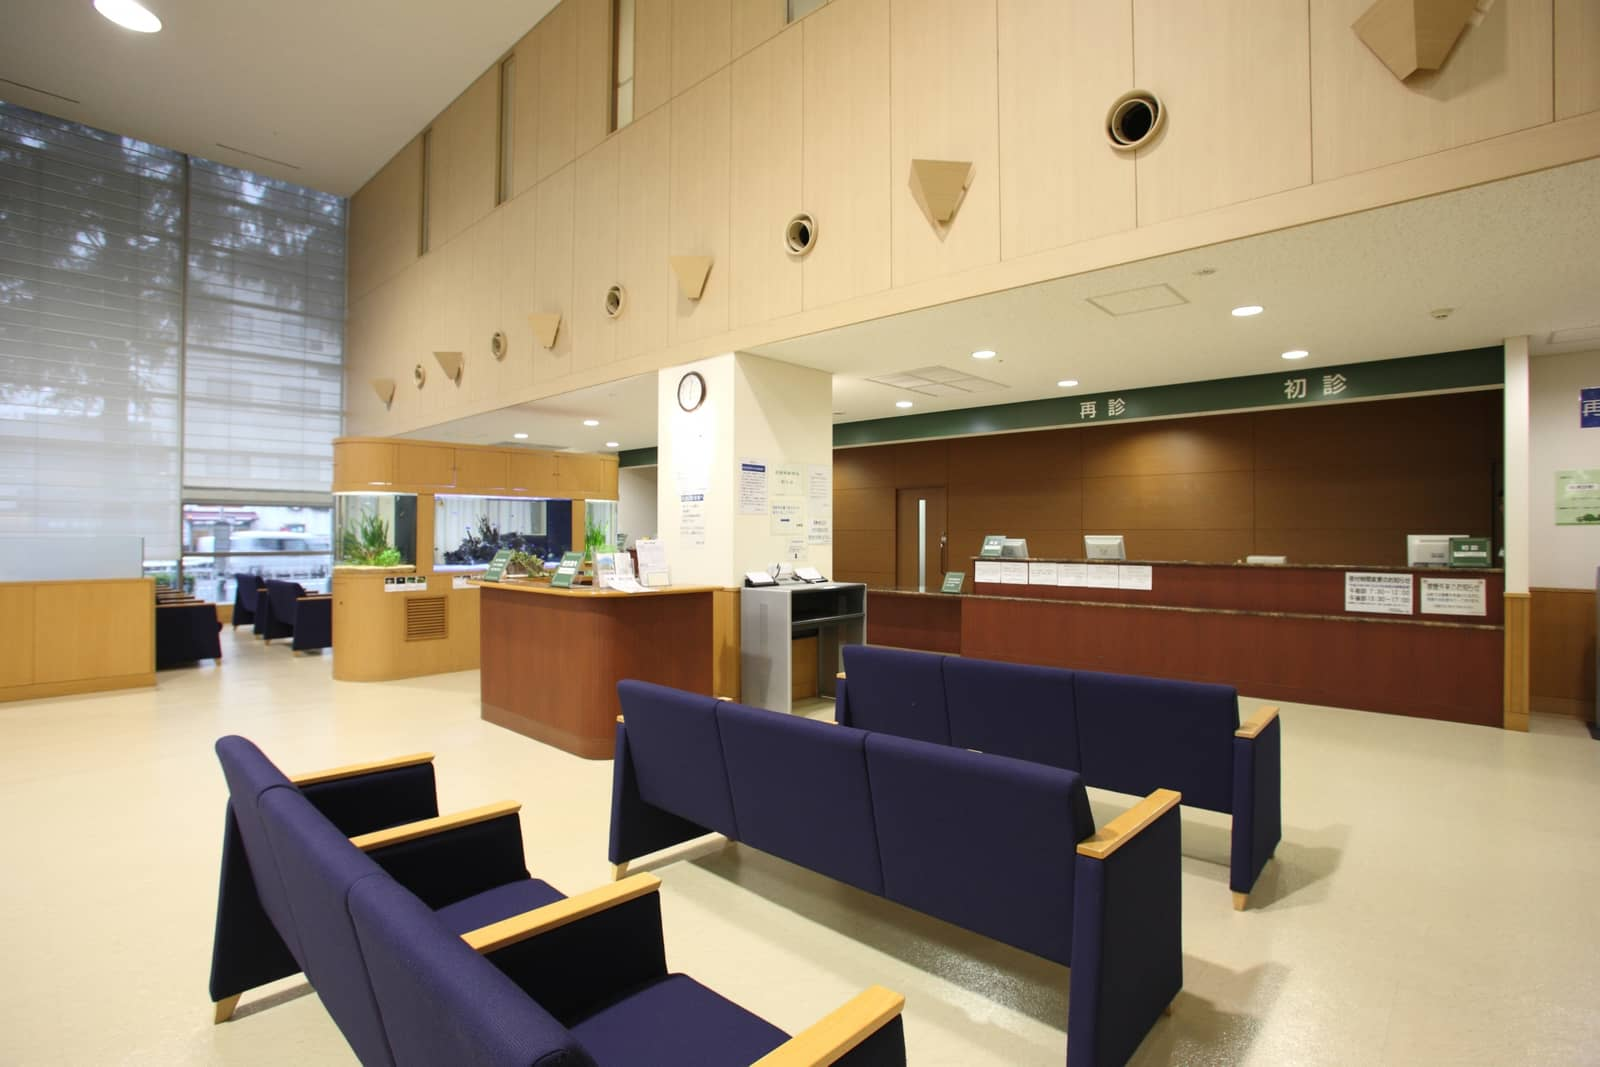 Lobby in the hospital